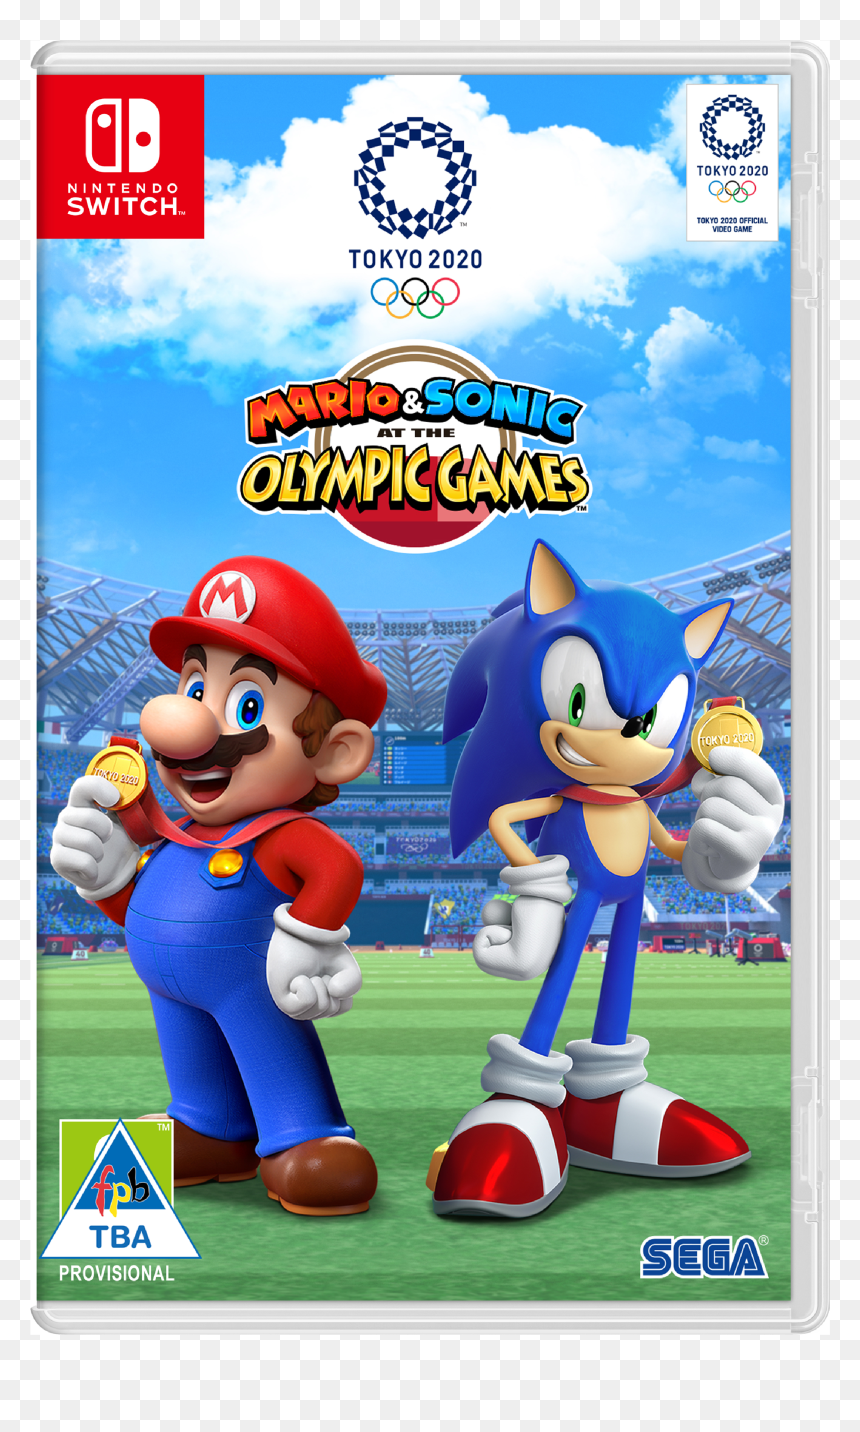 Sonic The Hedgehog 2020 Hd Png Download Vhv